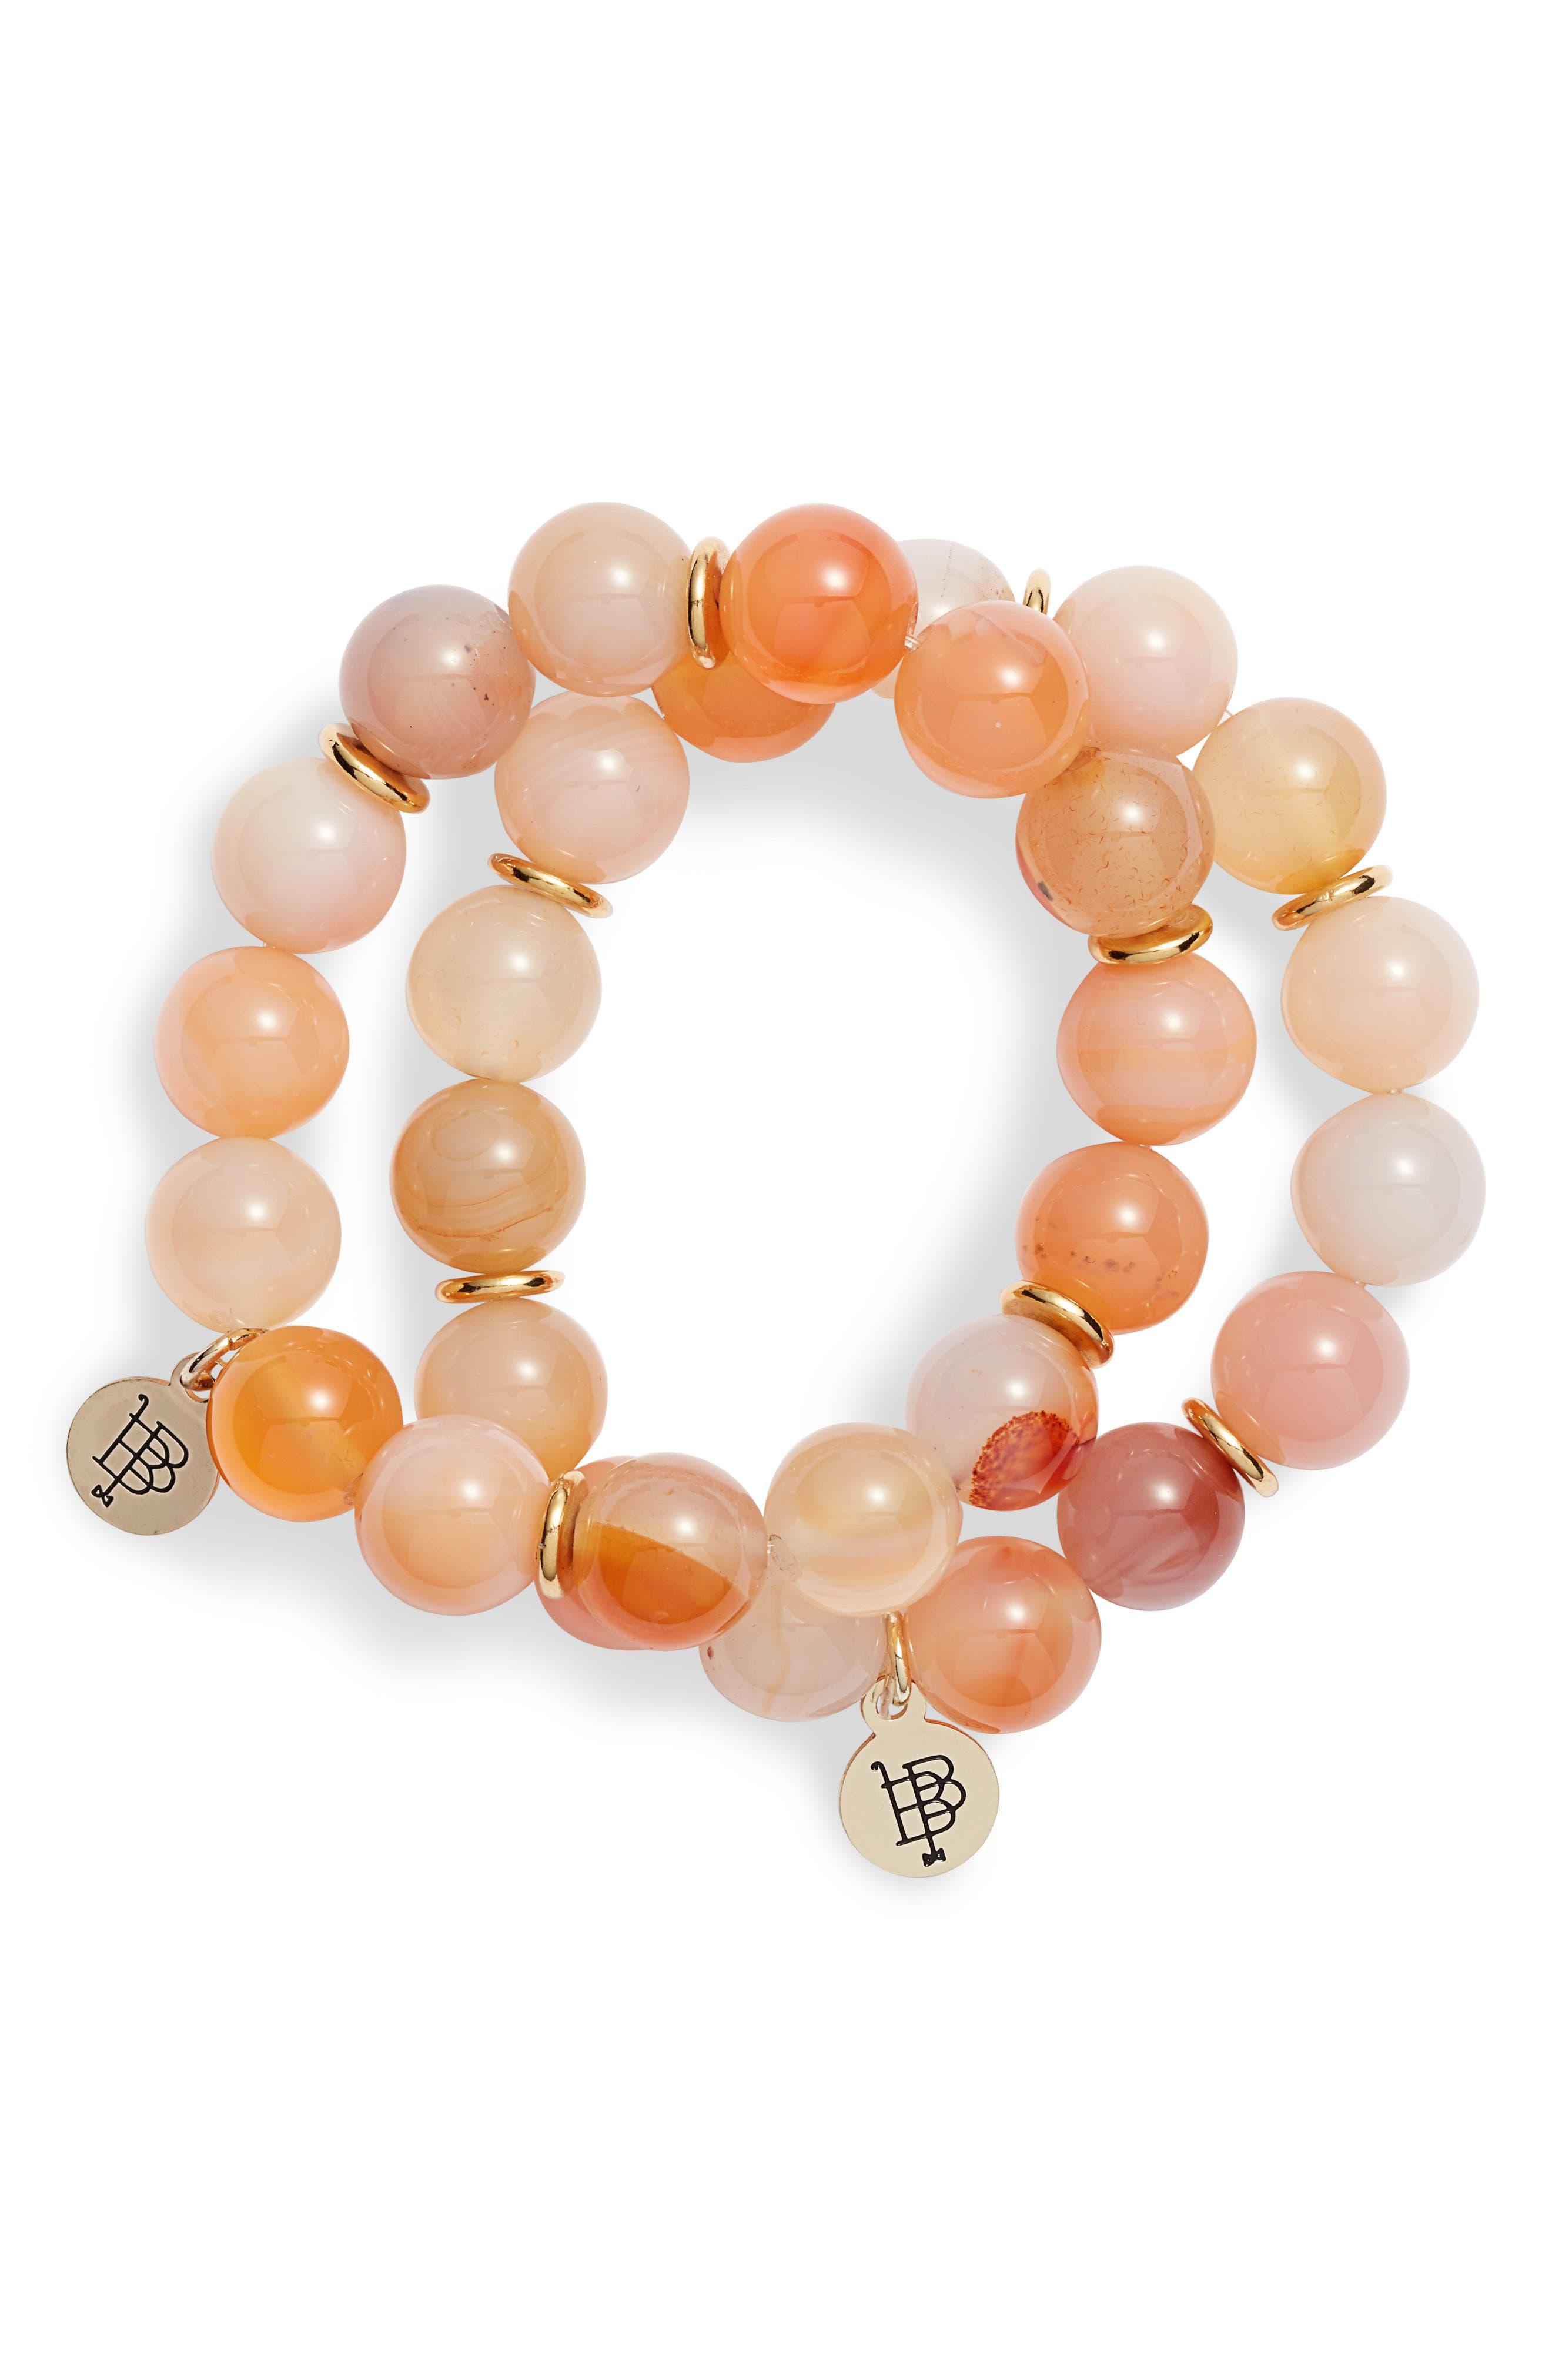 BOURBON AND BOWETIES Set of 2 Stone Beaded Stretch Bracelets, Main, color, ORANGE